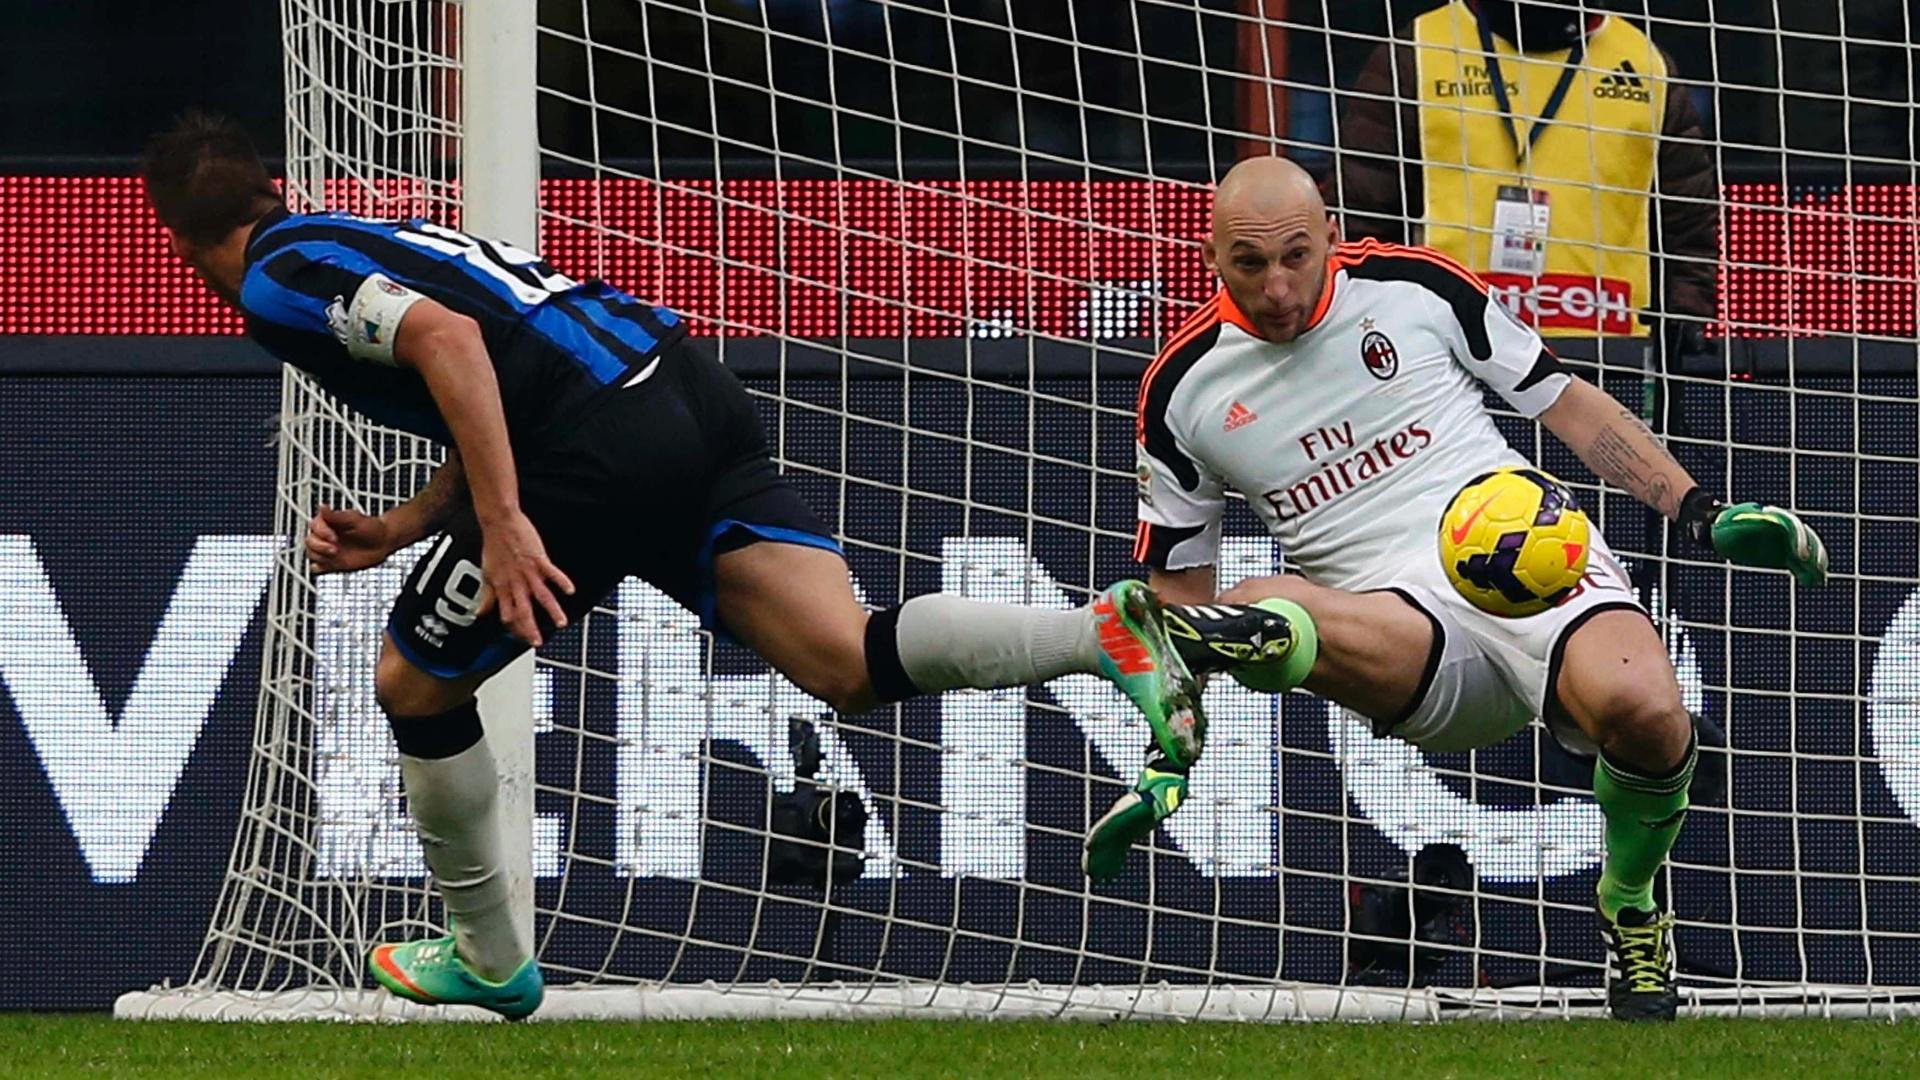 6.jan.2014 - Goleiro Abbiati, do Milan, faz defesa após chute do atacante Denis, do Atalanta